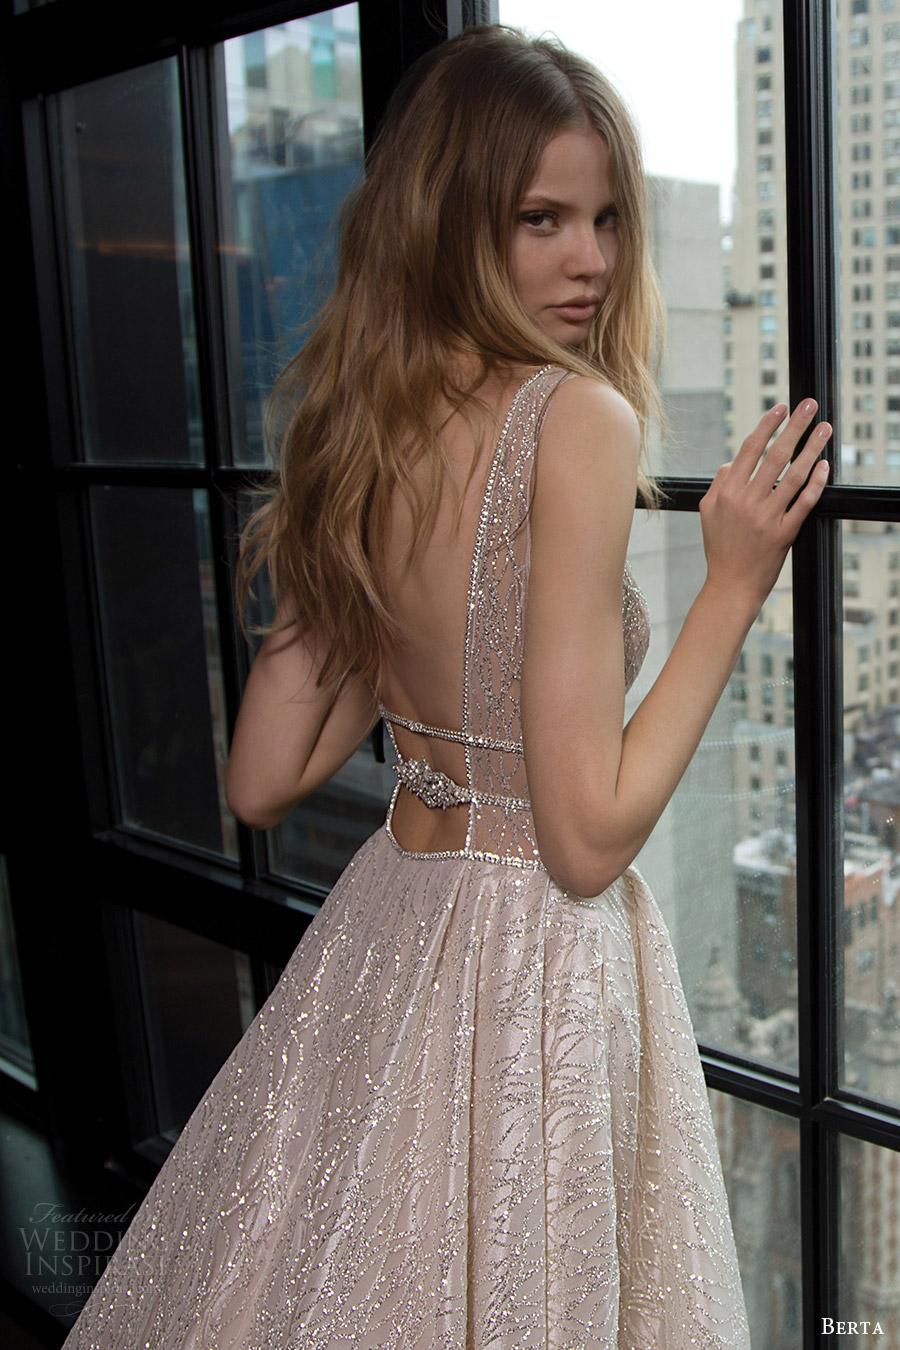 berta bridal fall 2016 sleeveless deep vneck embellished aline wedding dress (16 101) zbv